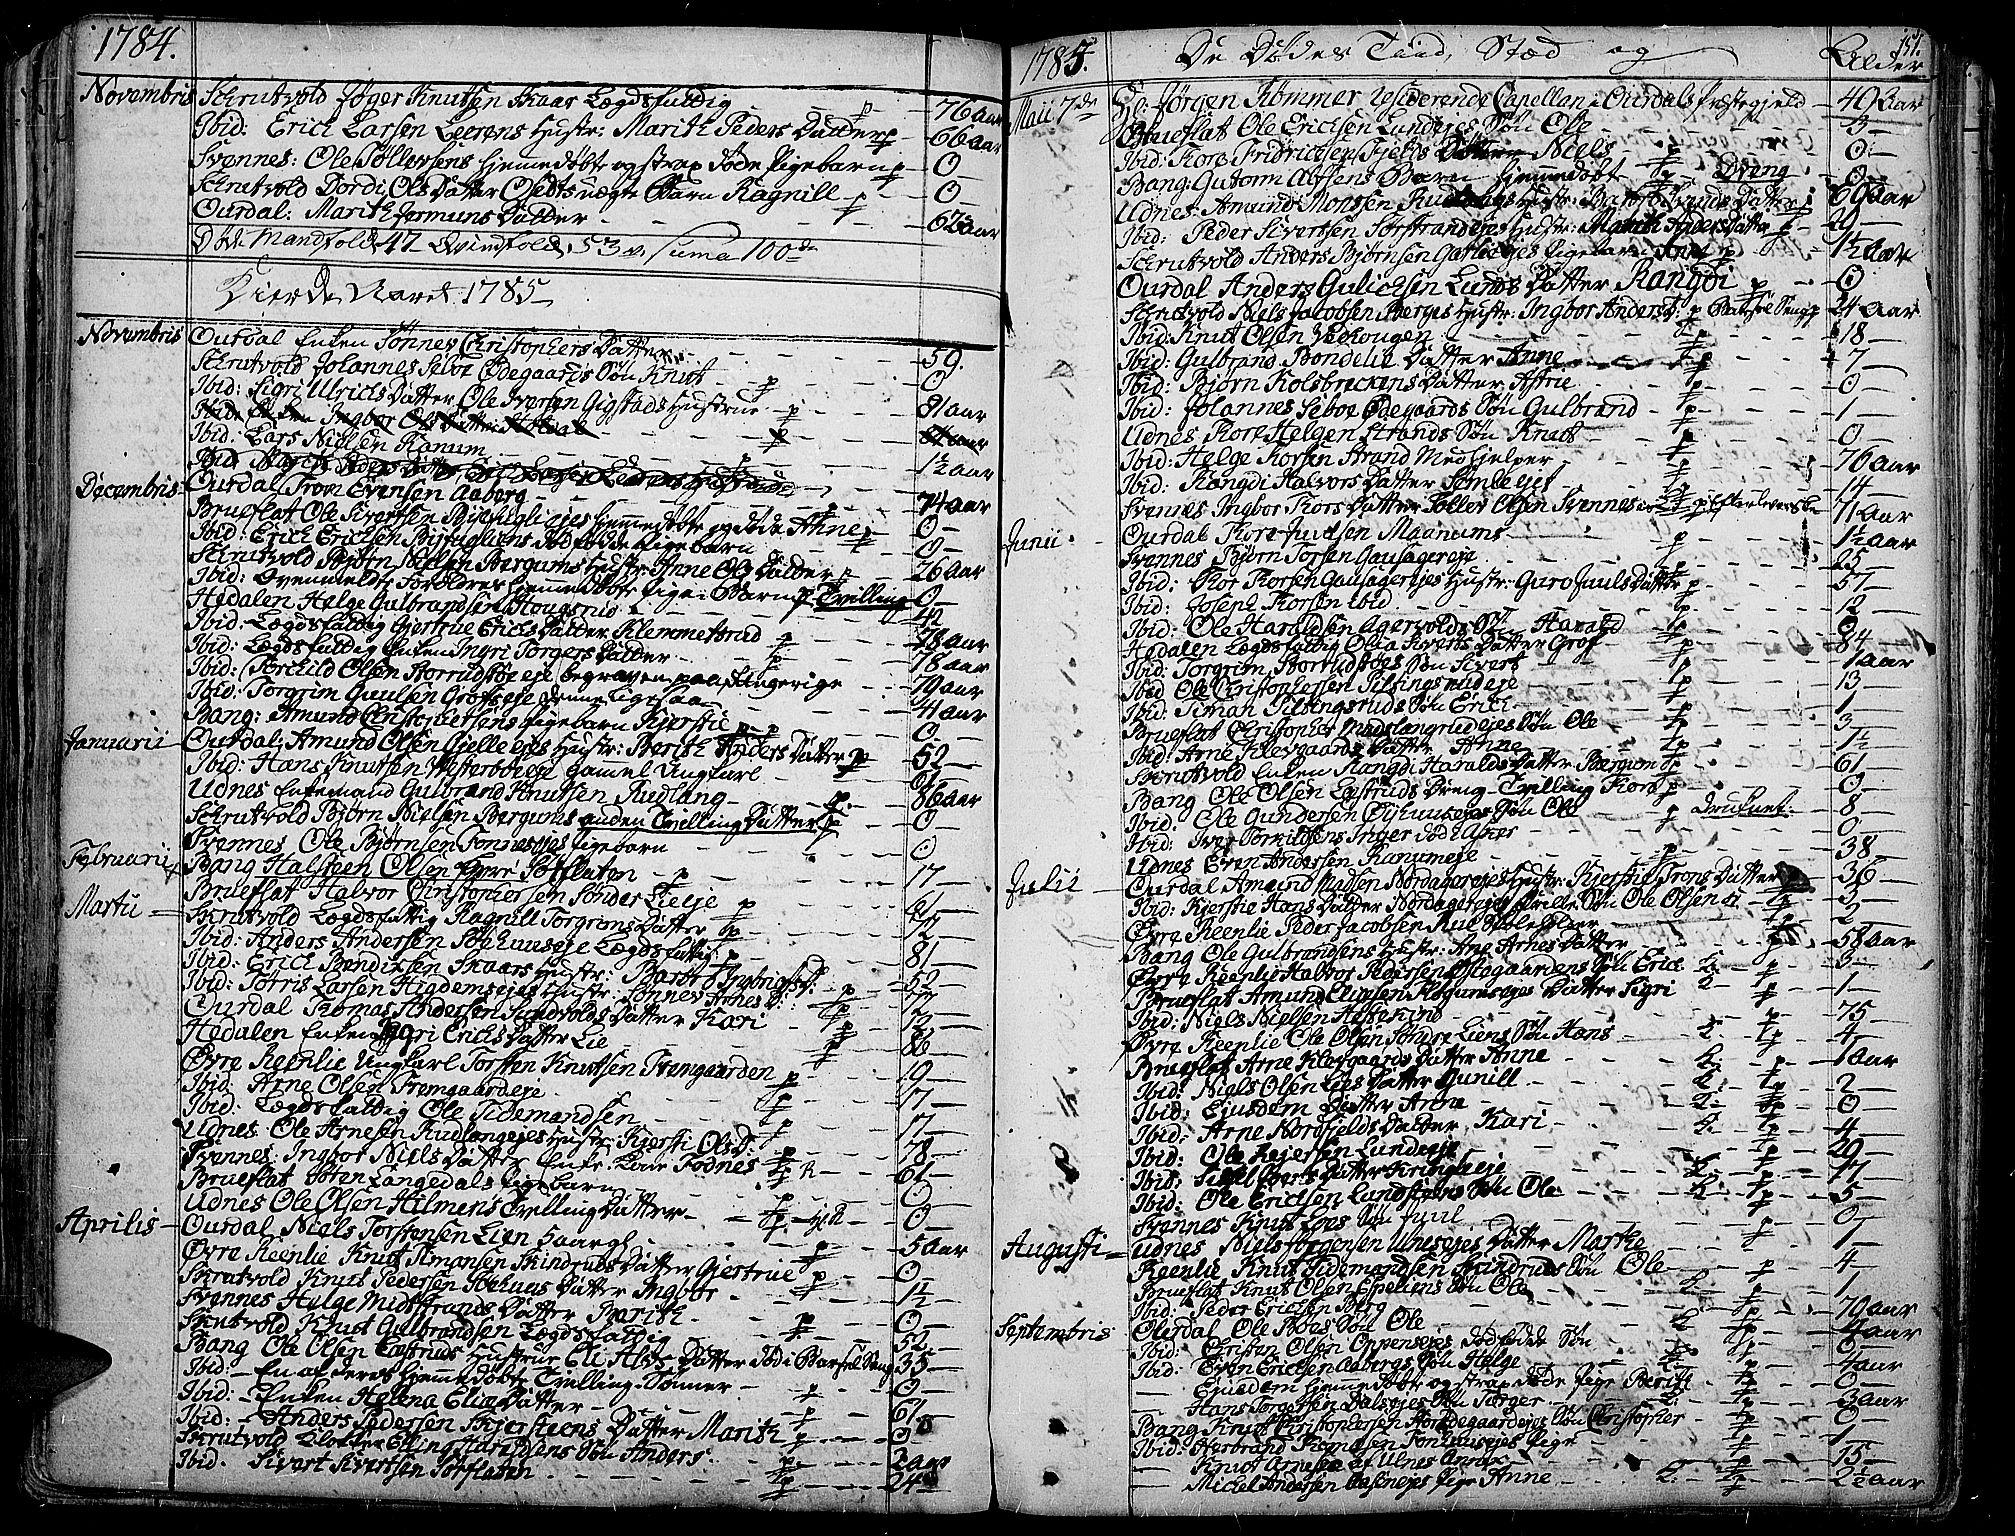 SAH, Aurdal prestekontor, Ministerialbok nr. 6, 1781-1804, s. 151